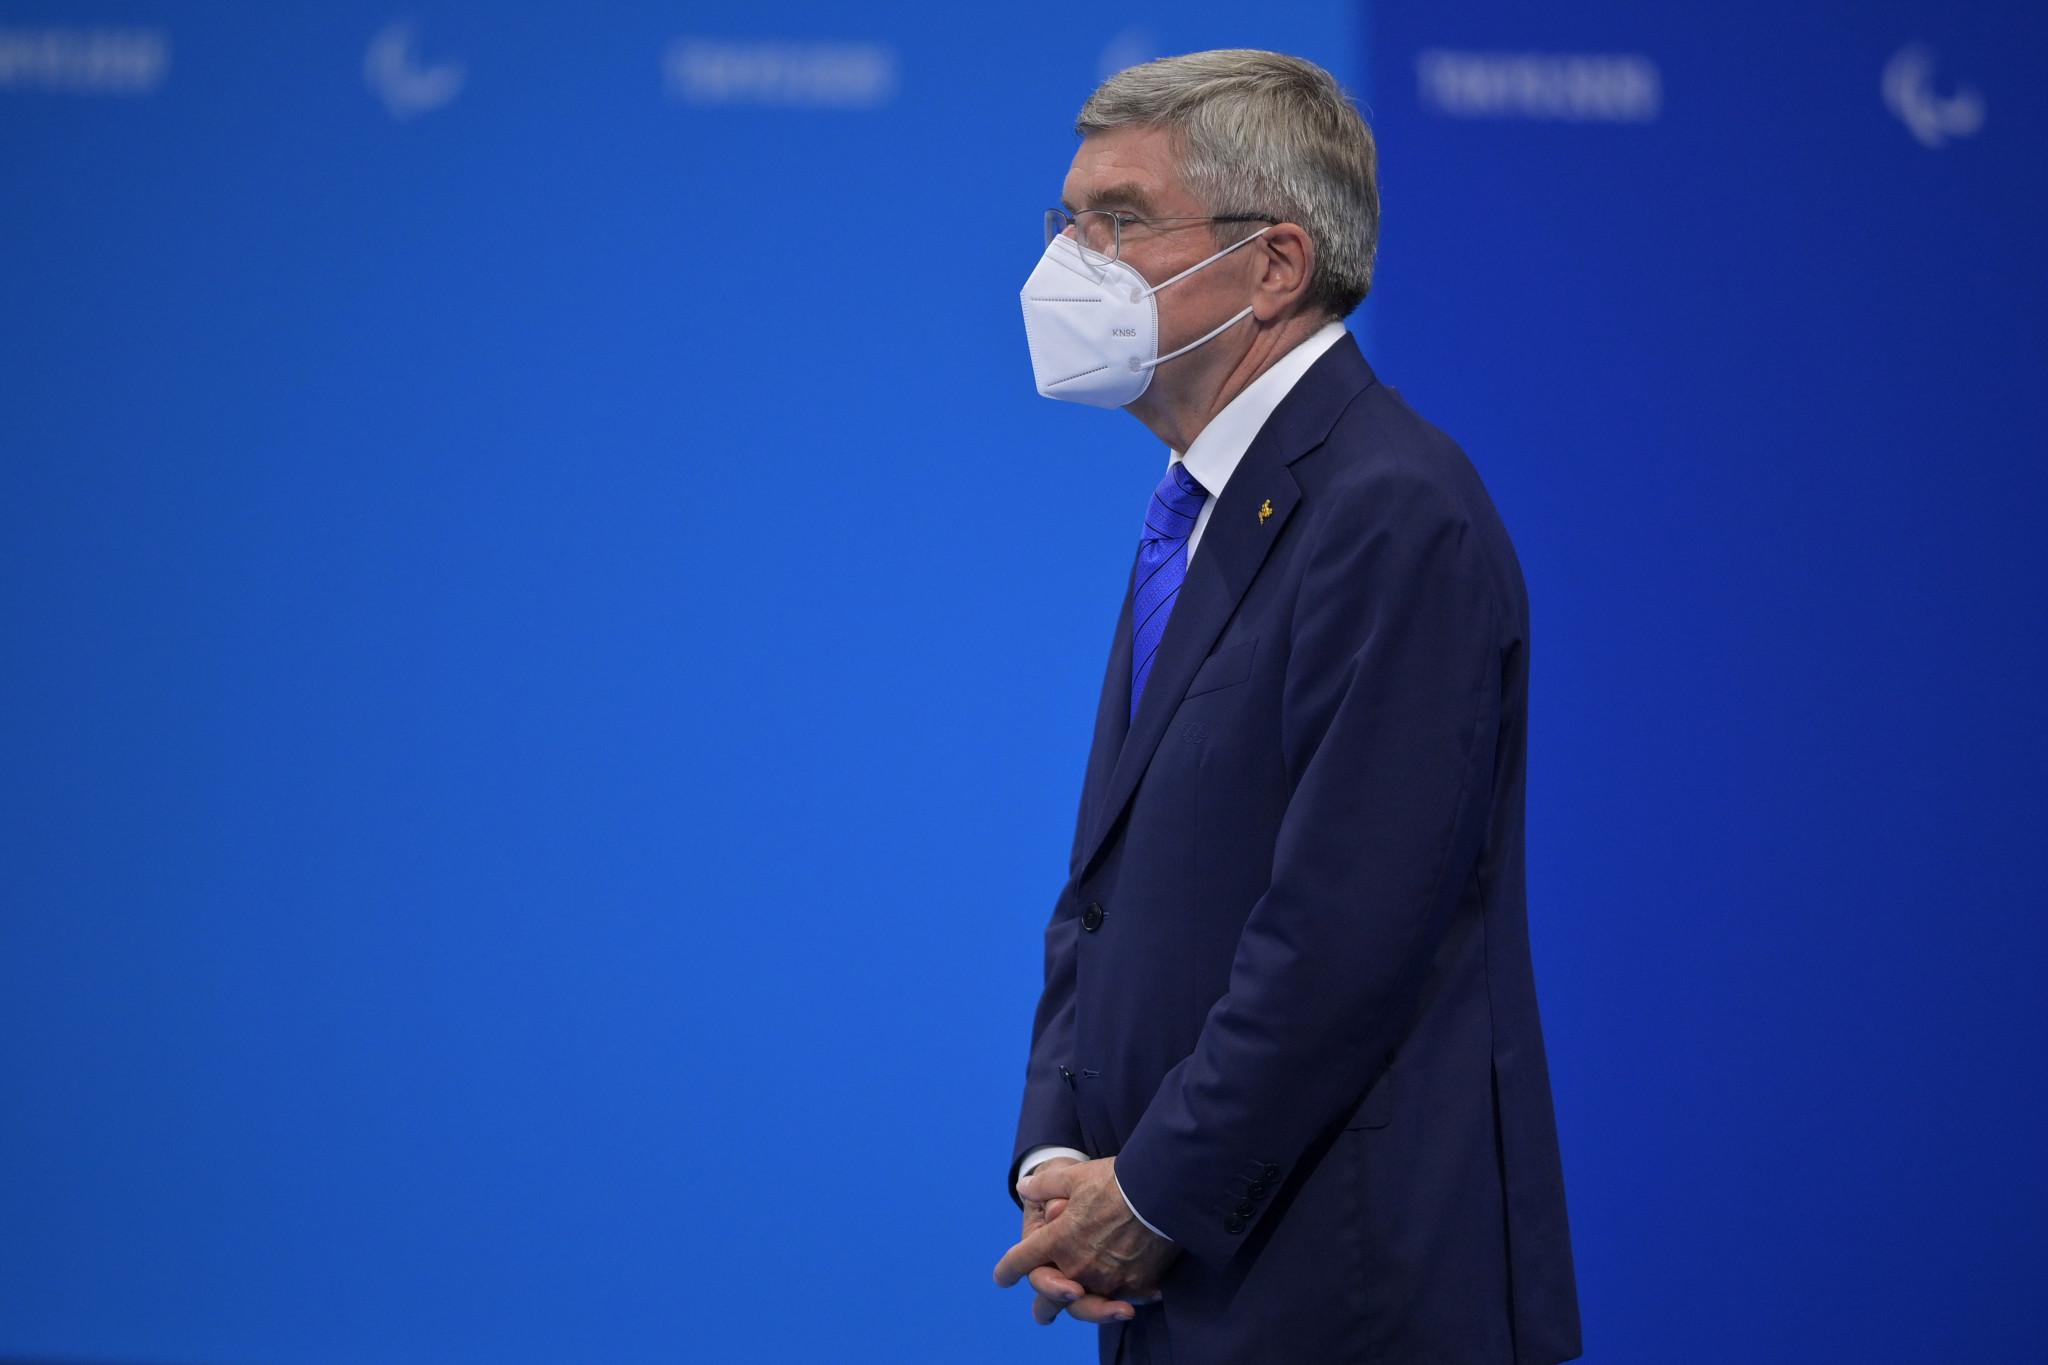 Sarah Davies said IOC President Thomas Bach had told her there was